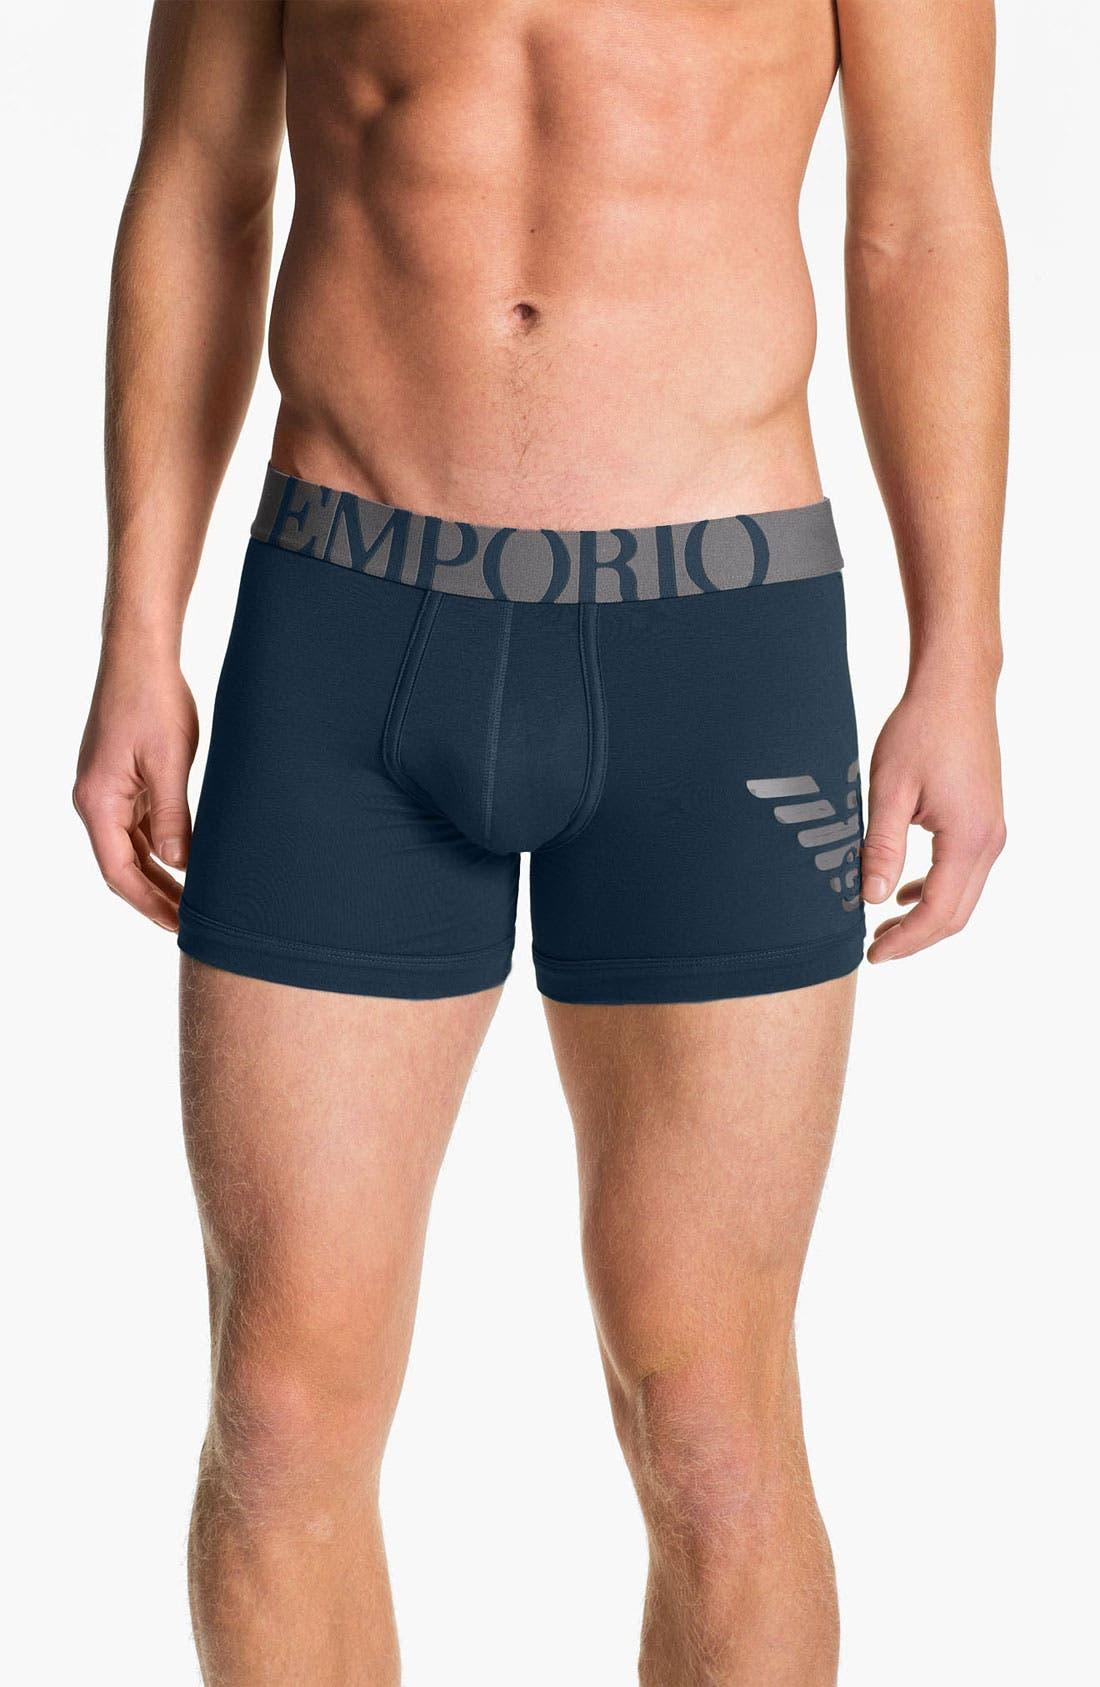 Alternate Image 1 Selected - Emporio Armani 'Eagle' Stretch Cotton Boxer Briefs